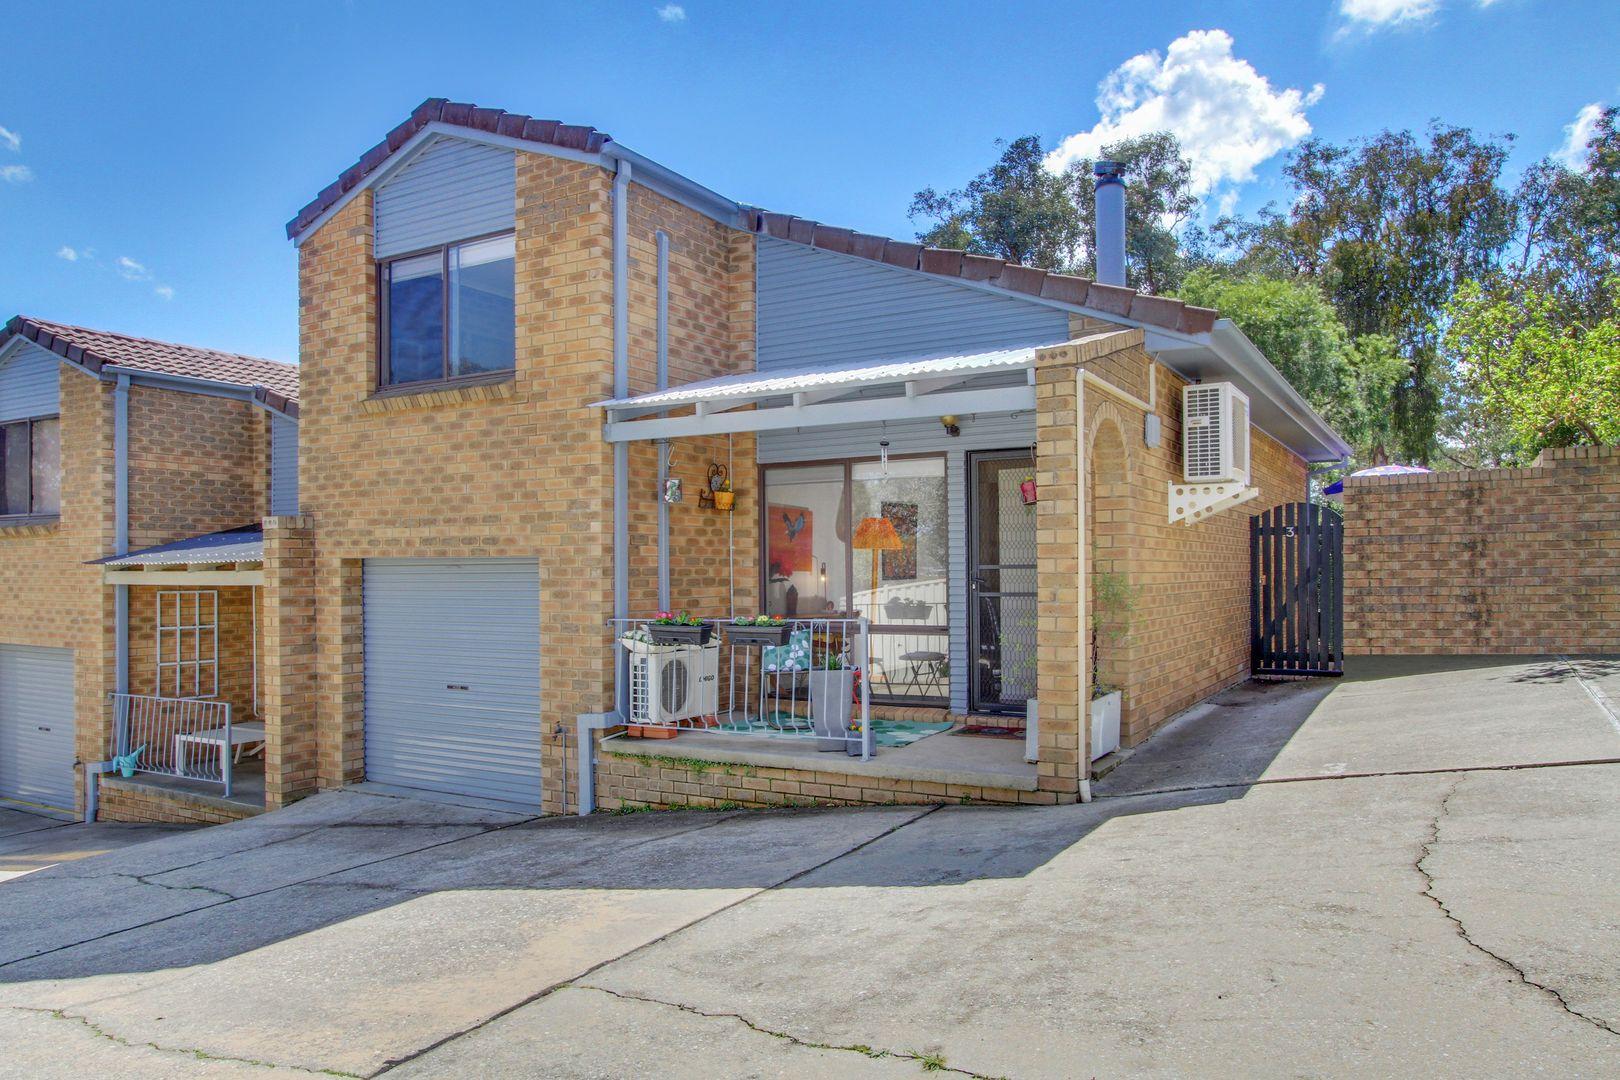 3/9 Hybon Avenue, Queanbeyan NSW 2620, Image 0